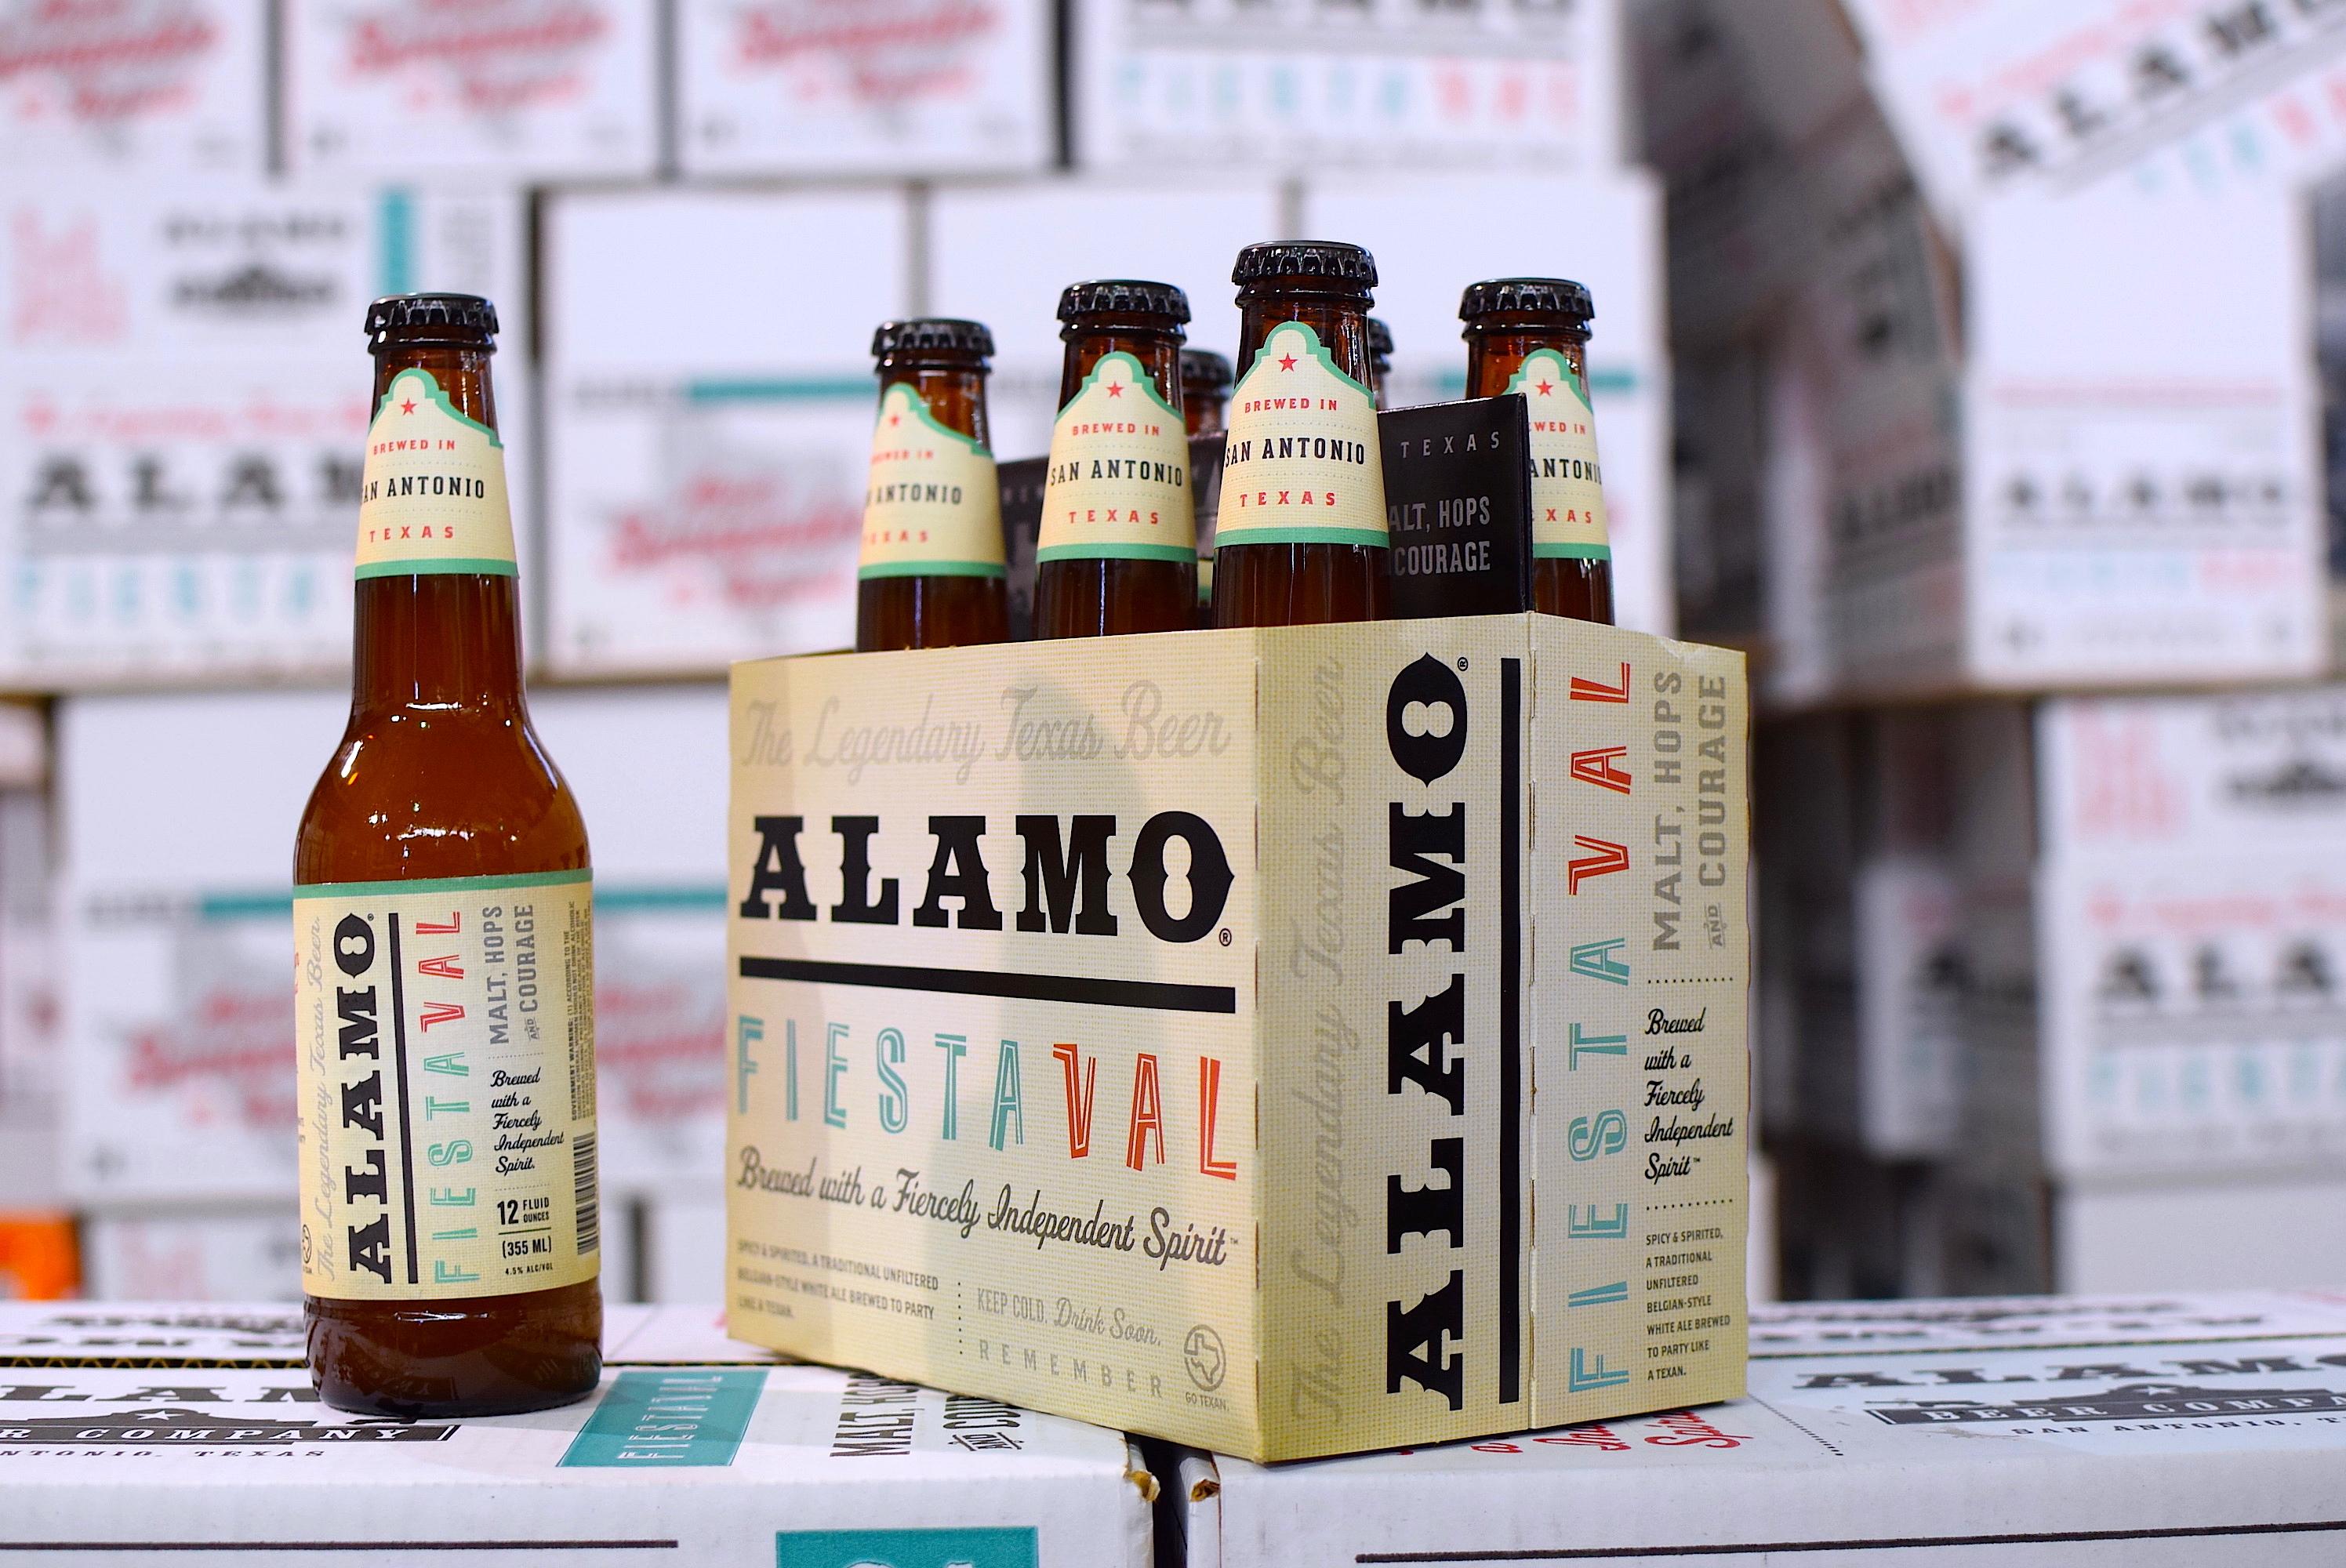 Fiestaval alamo beer company san antonio texas home for Craft beer san antonio